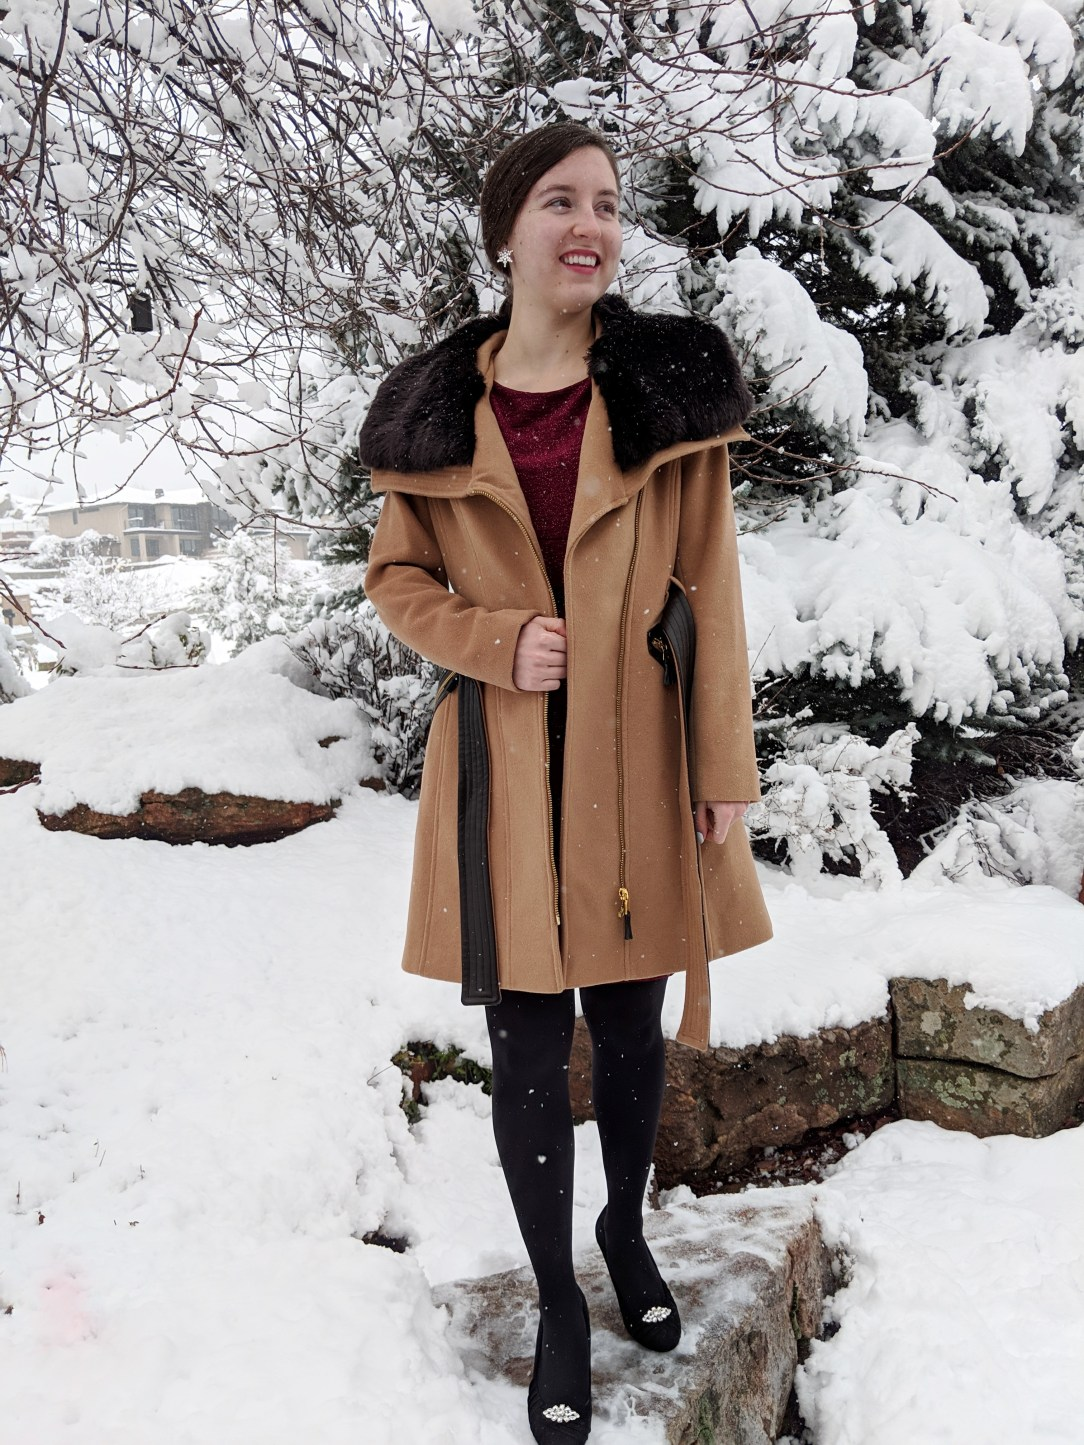 camel coat with fur collar